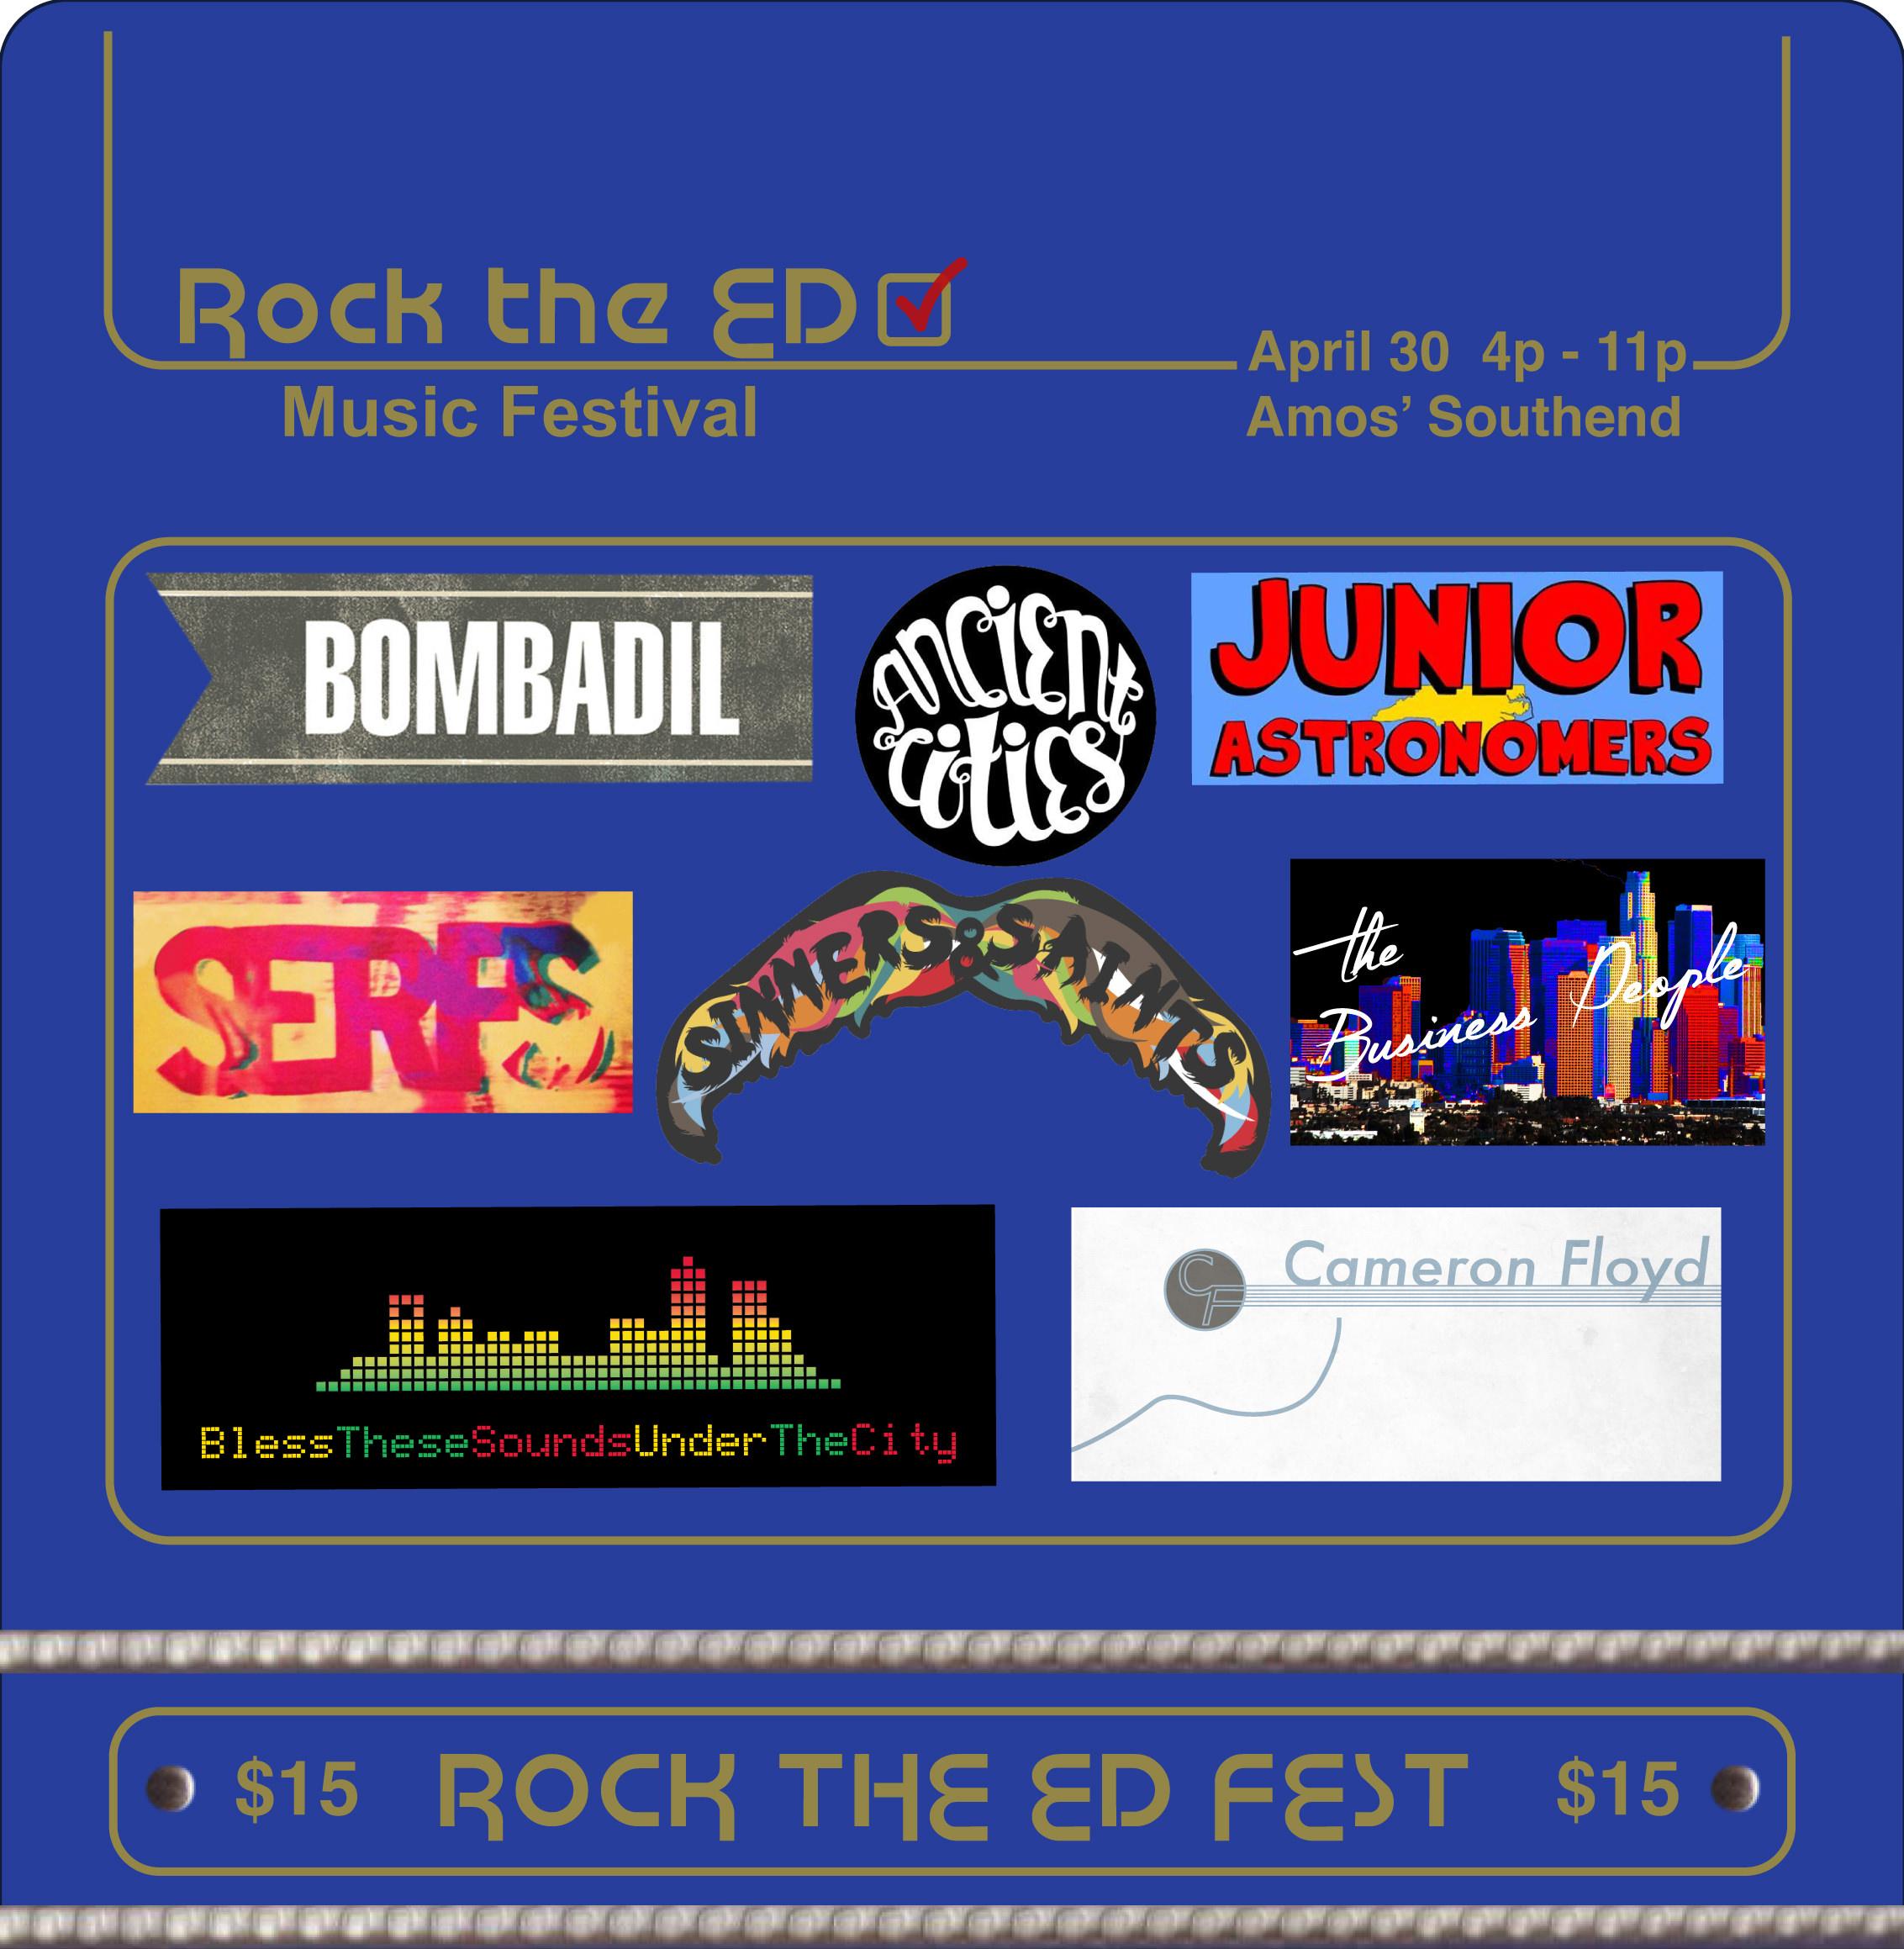 Rock the Ed Music Fest